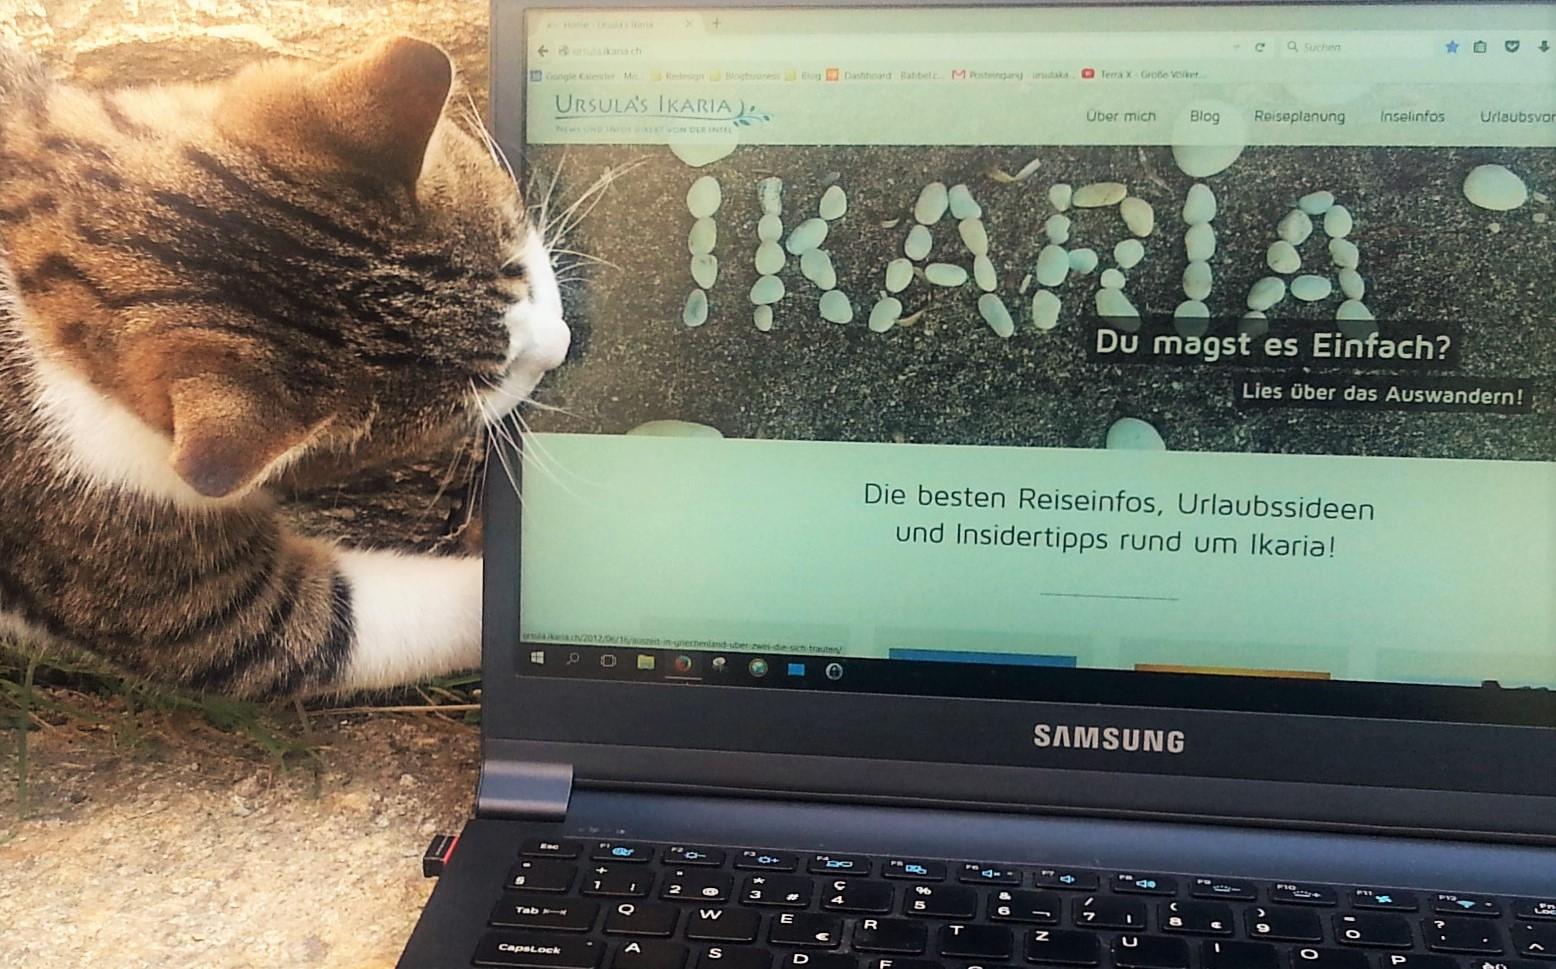 Aias frisst meinen Laptop